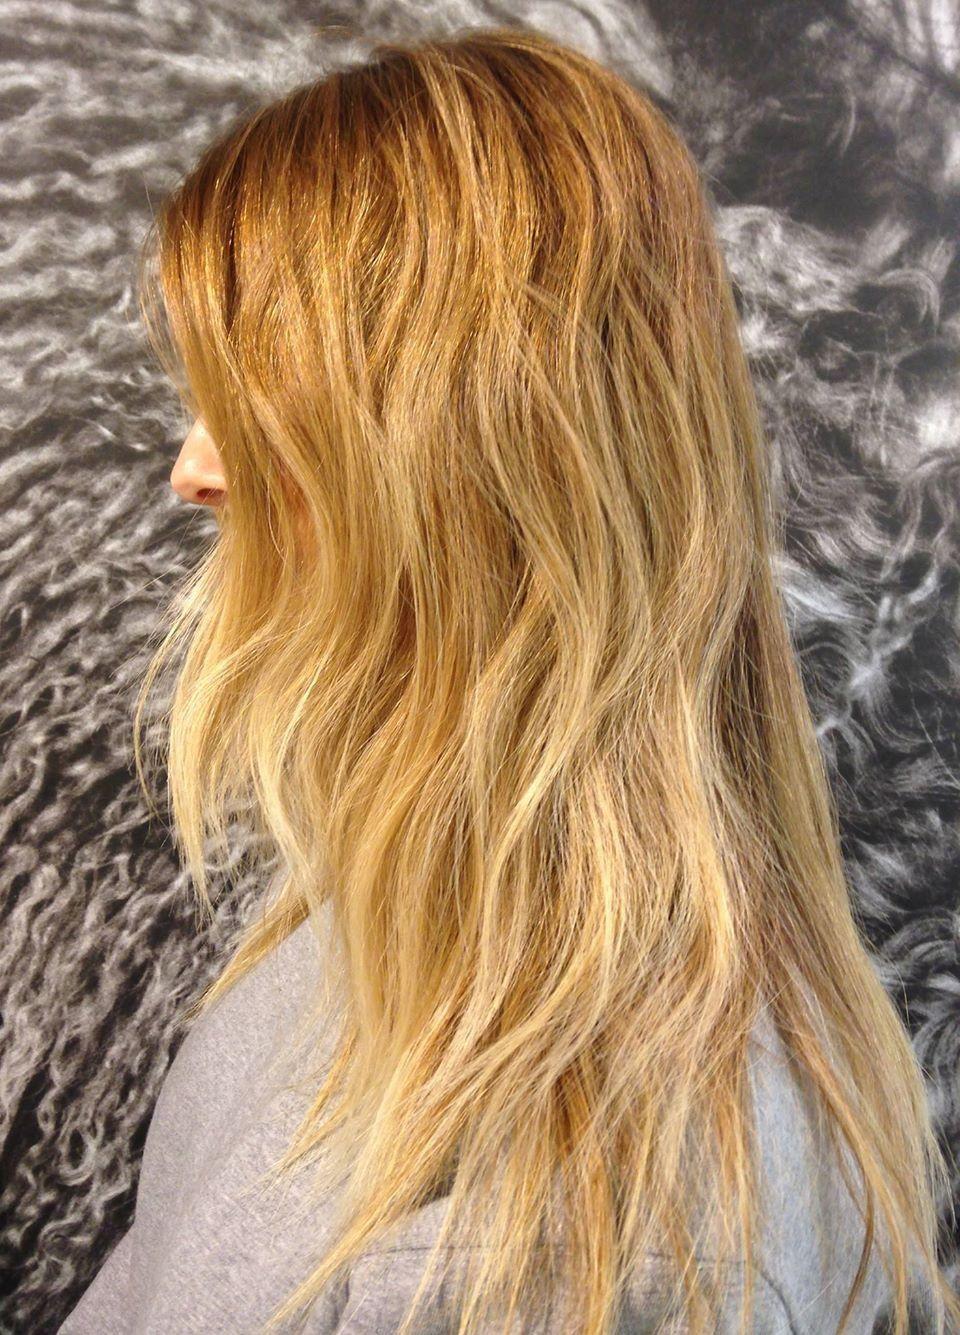 Bleach color bleached hair hair inspiration bleach color